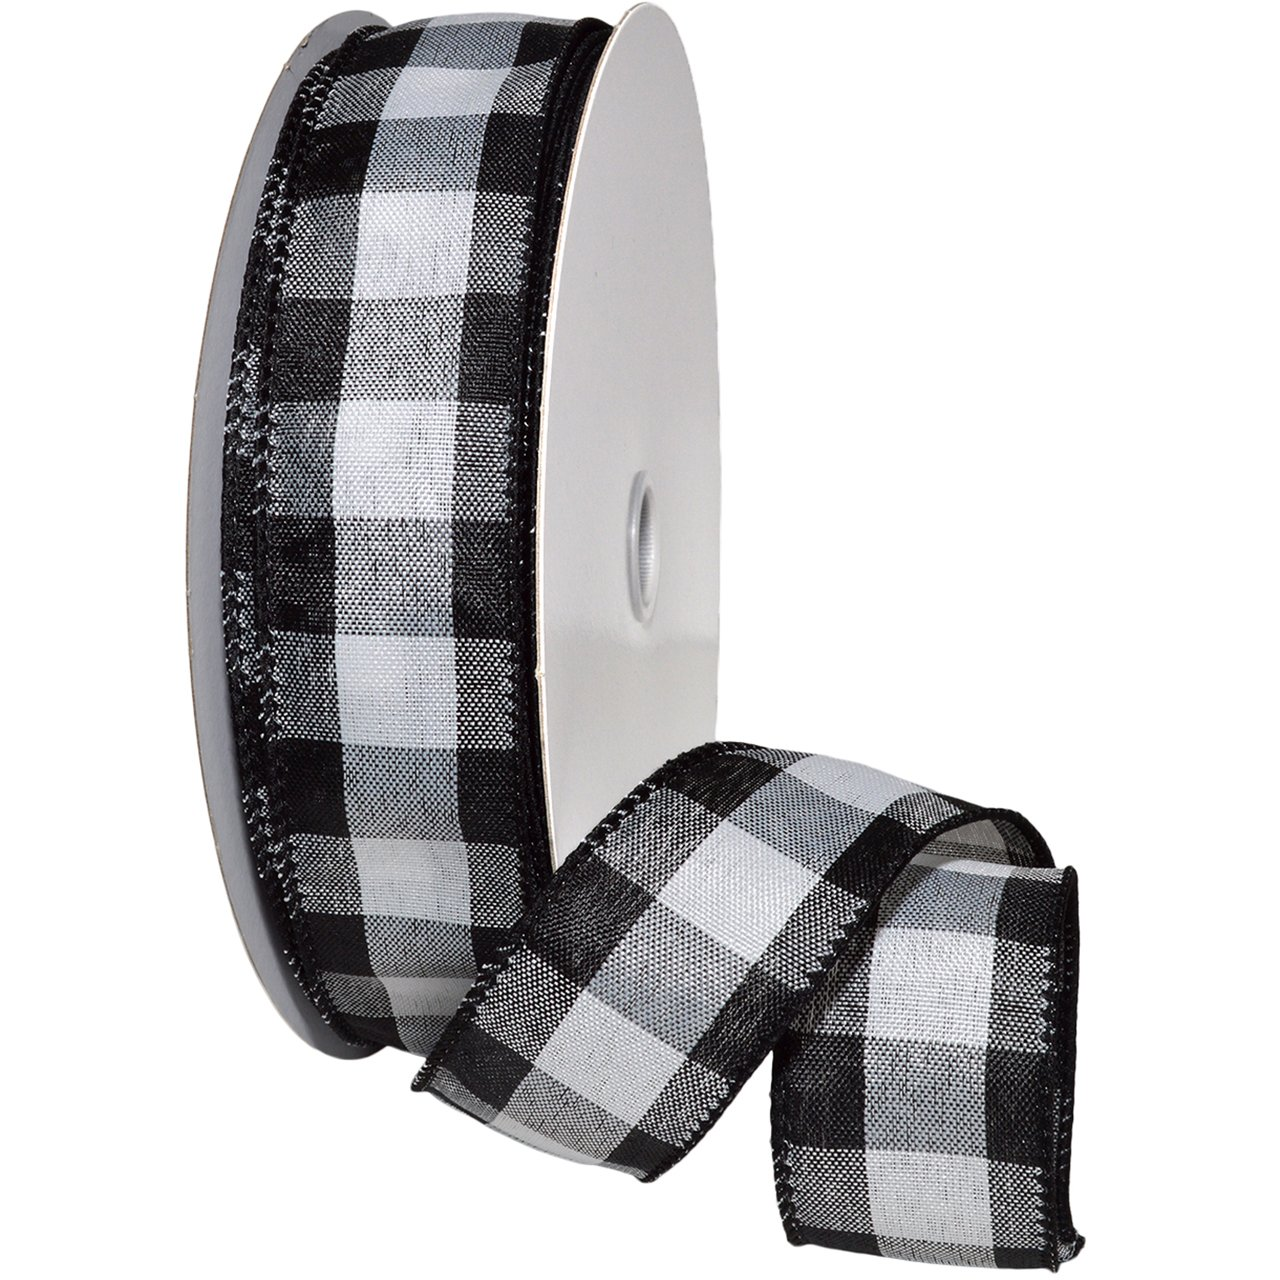 Morex Cambridge Wired Taffeta Ribbon, 1-1/2 by 50 yd, Black 1-1/2 by 50 yd Morex Ribbon 7398.40/50-613